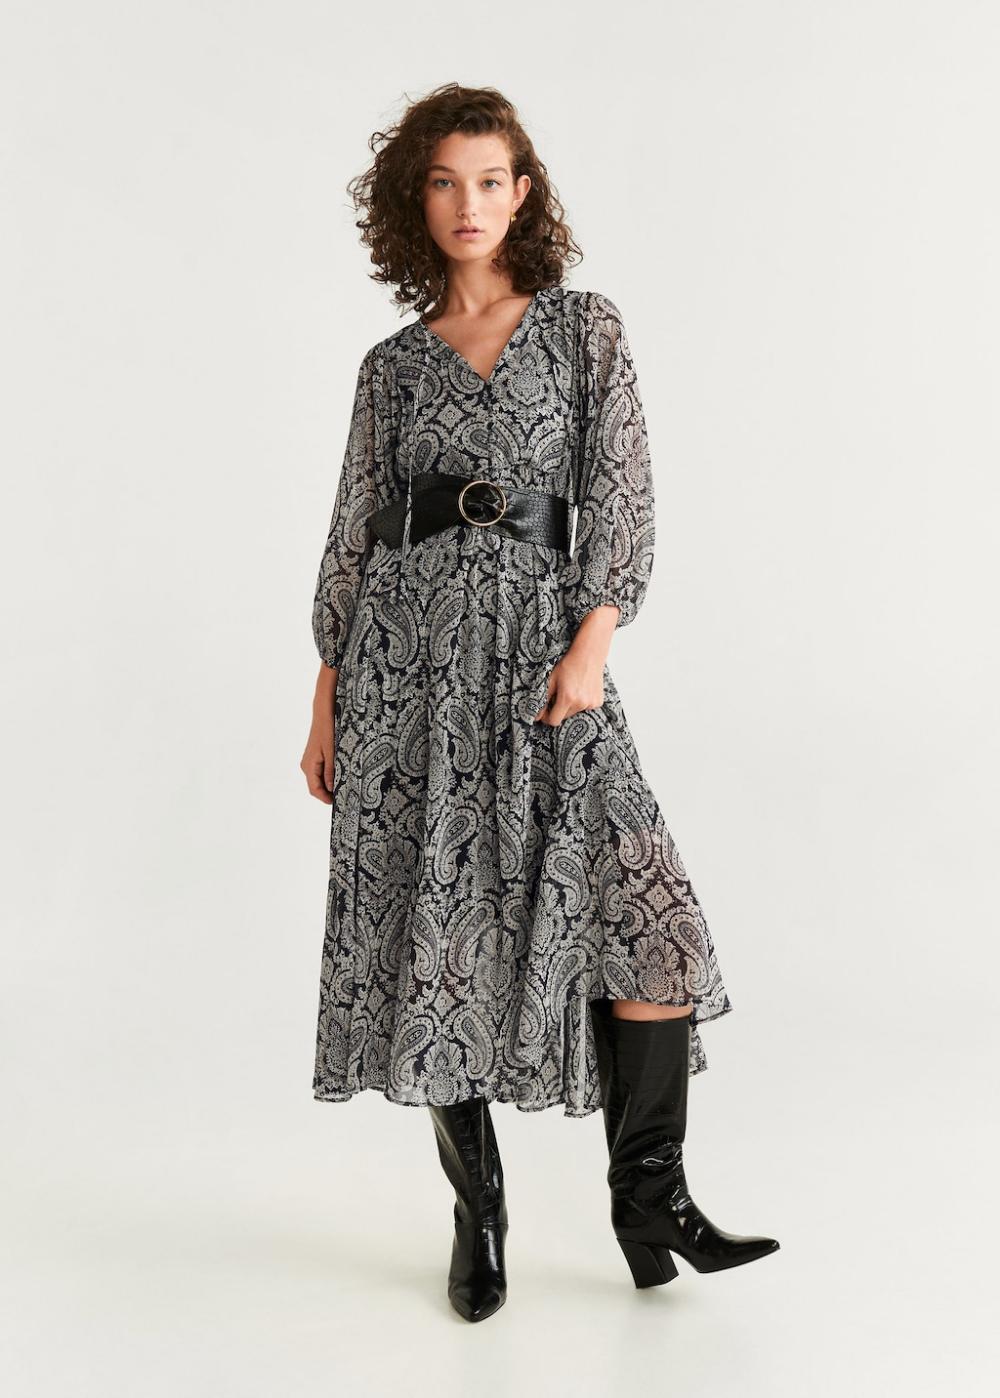 Mango Paisley Print Dress Fashion Dresses Casual Womens Dresses [ 1398 x 1000 Pixel ]